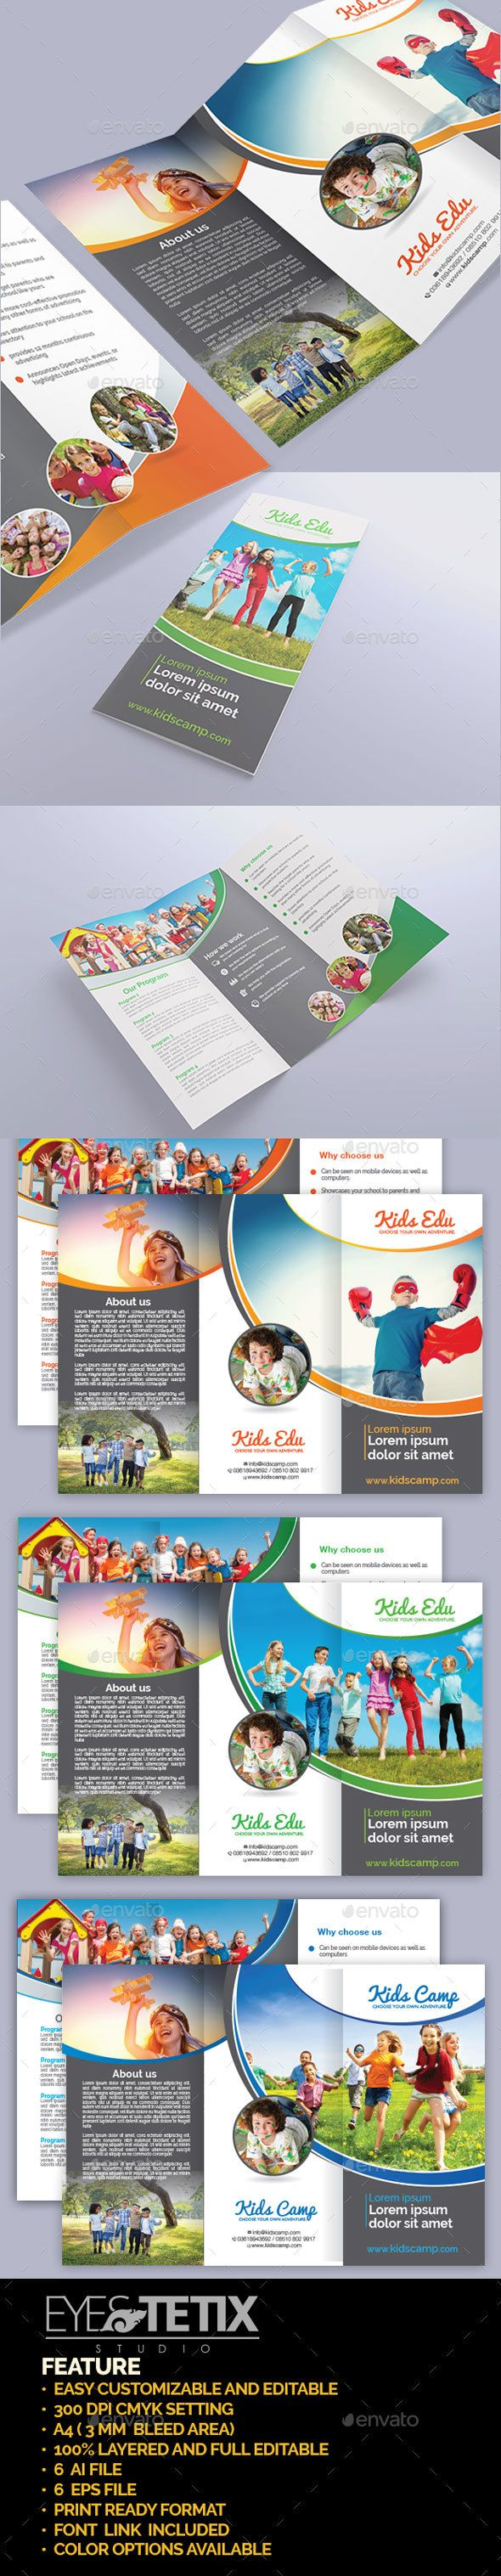 Kids Camp Education Brochure - Corporate Brochures